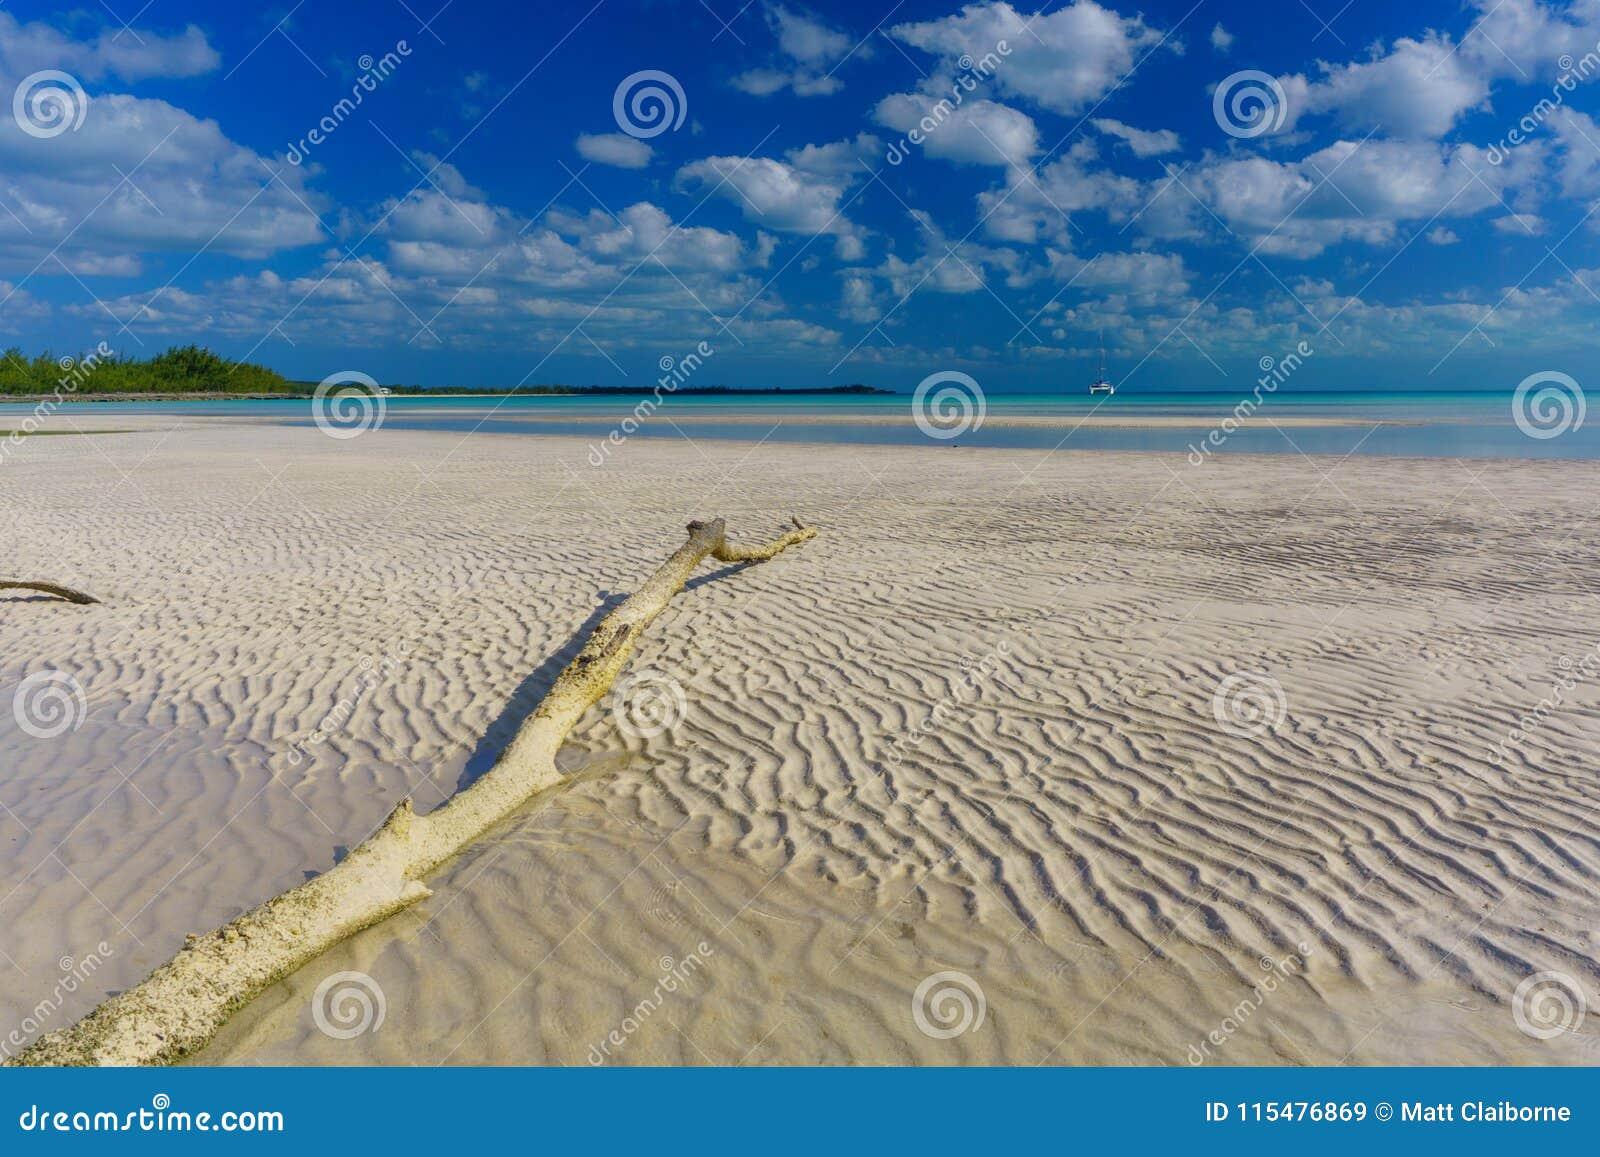 Driftwood i piaska czochry, Tropikalna plaża